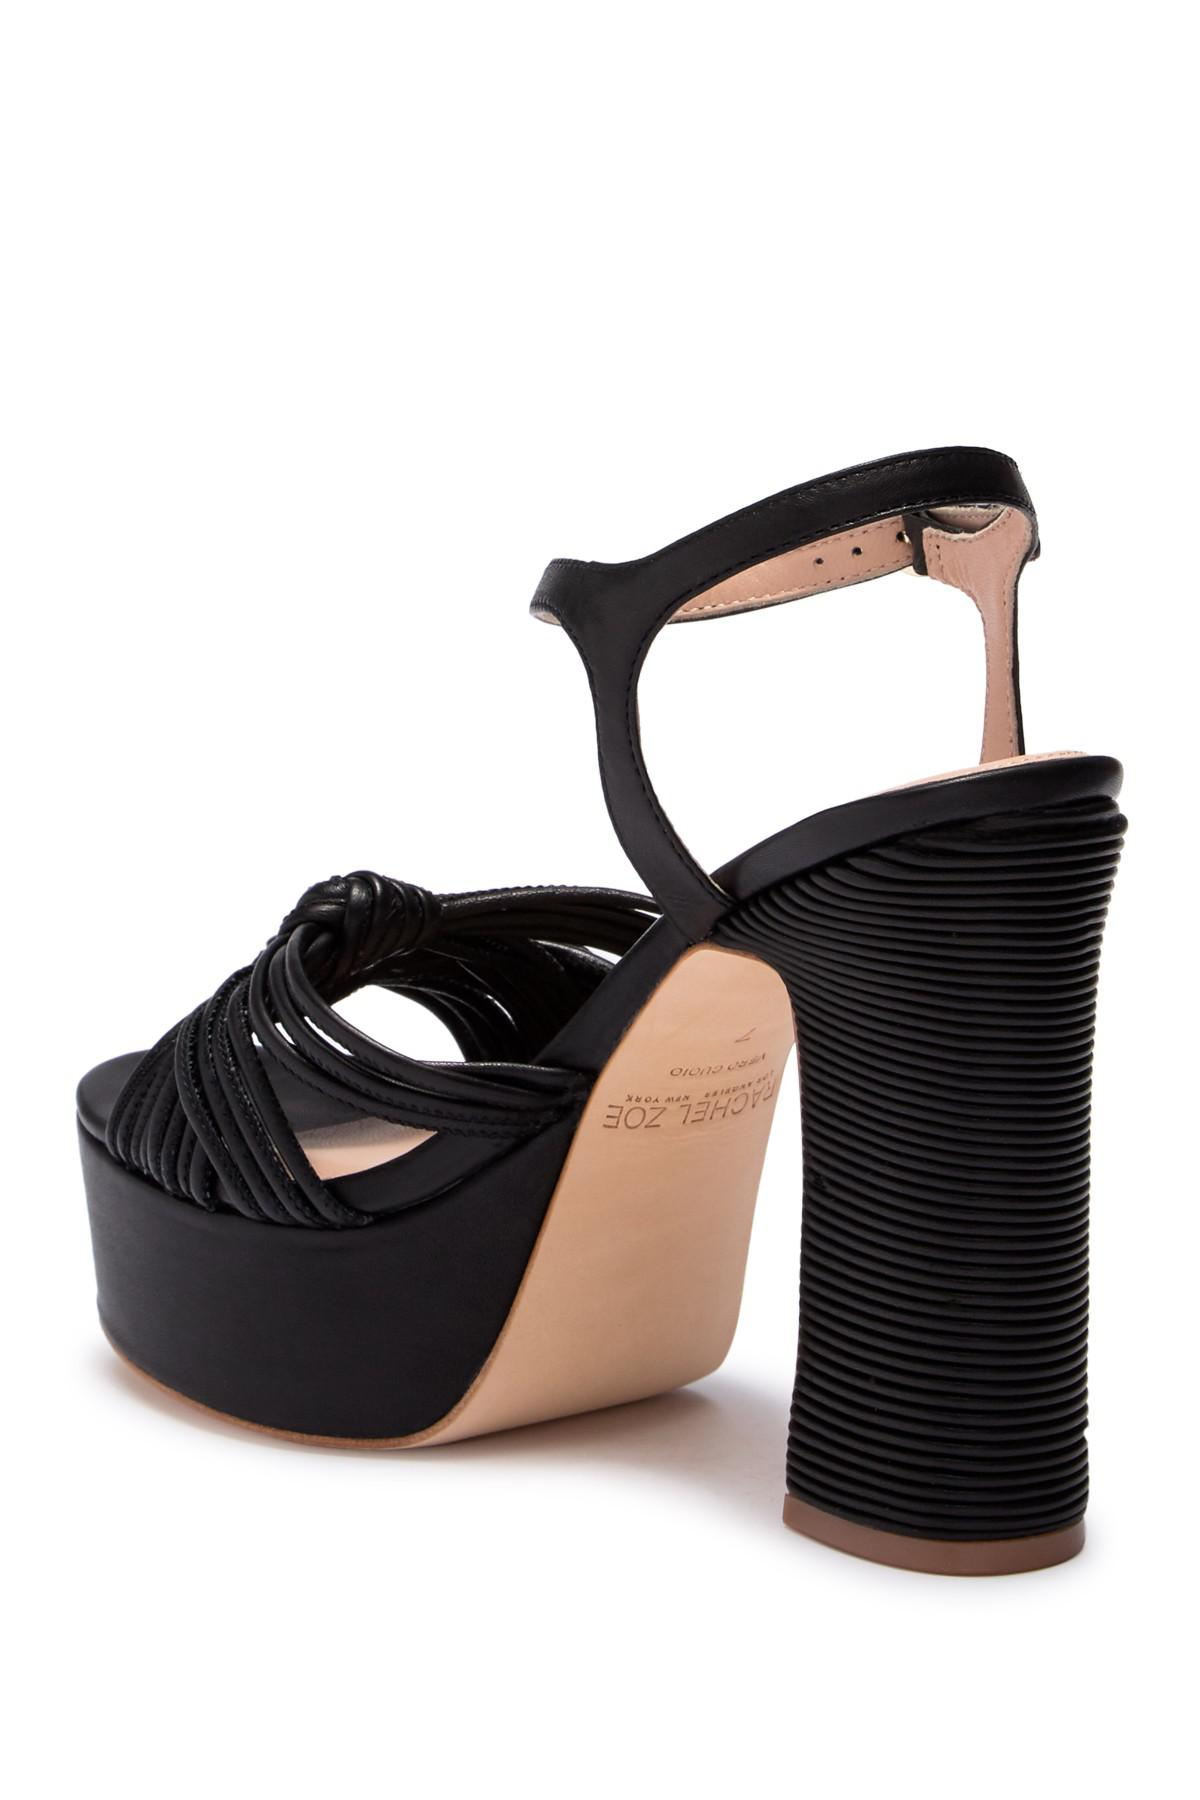 Rachel Zoe Avery Nappa Platform Sandal rFaHmmAwtW